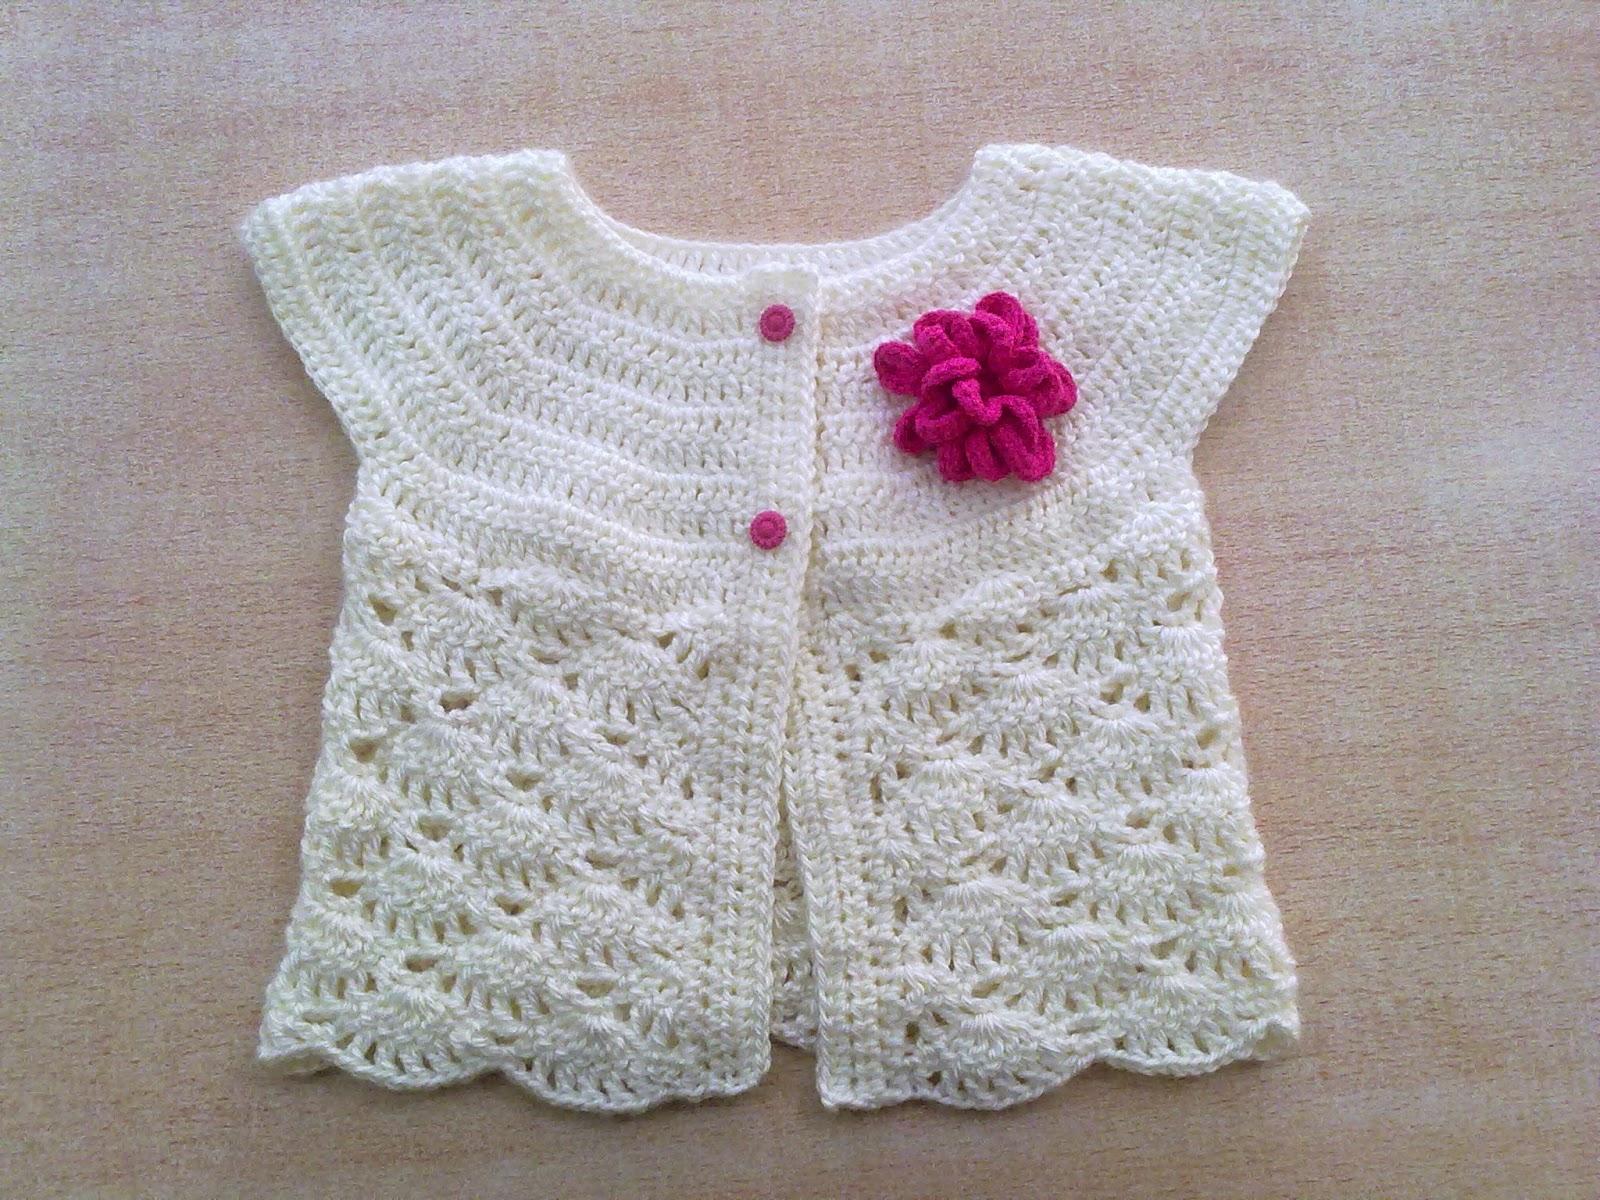 Liliana Milka Crochet: Chaleco con flor